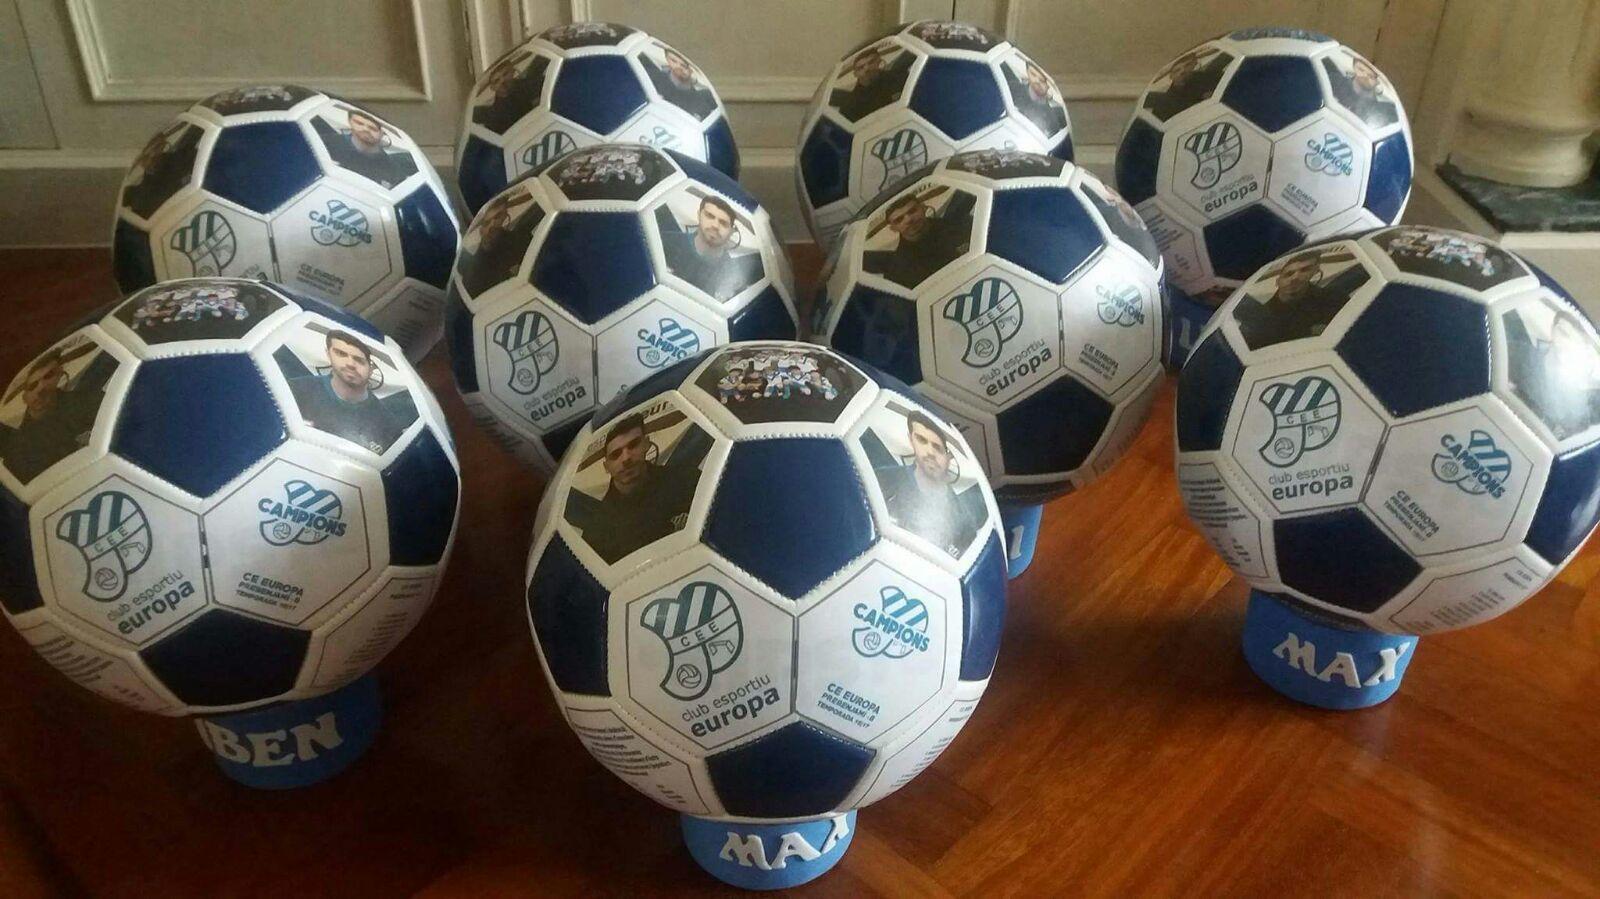 regalos entrenadores balones futbol  0a7e3851ca9c3